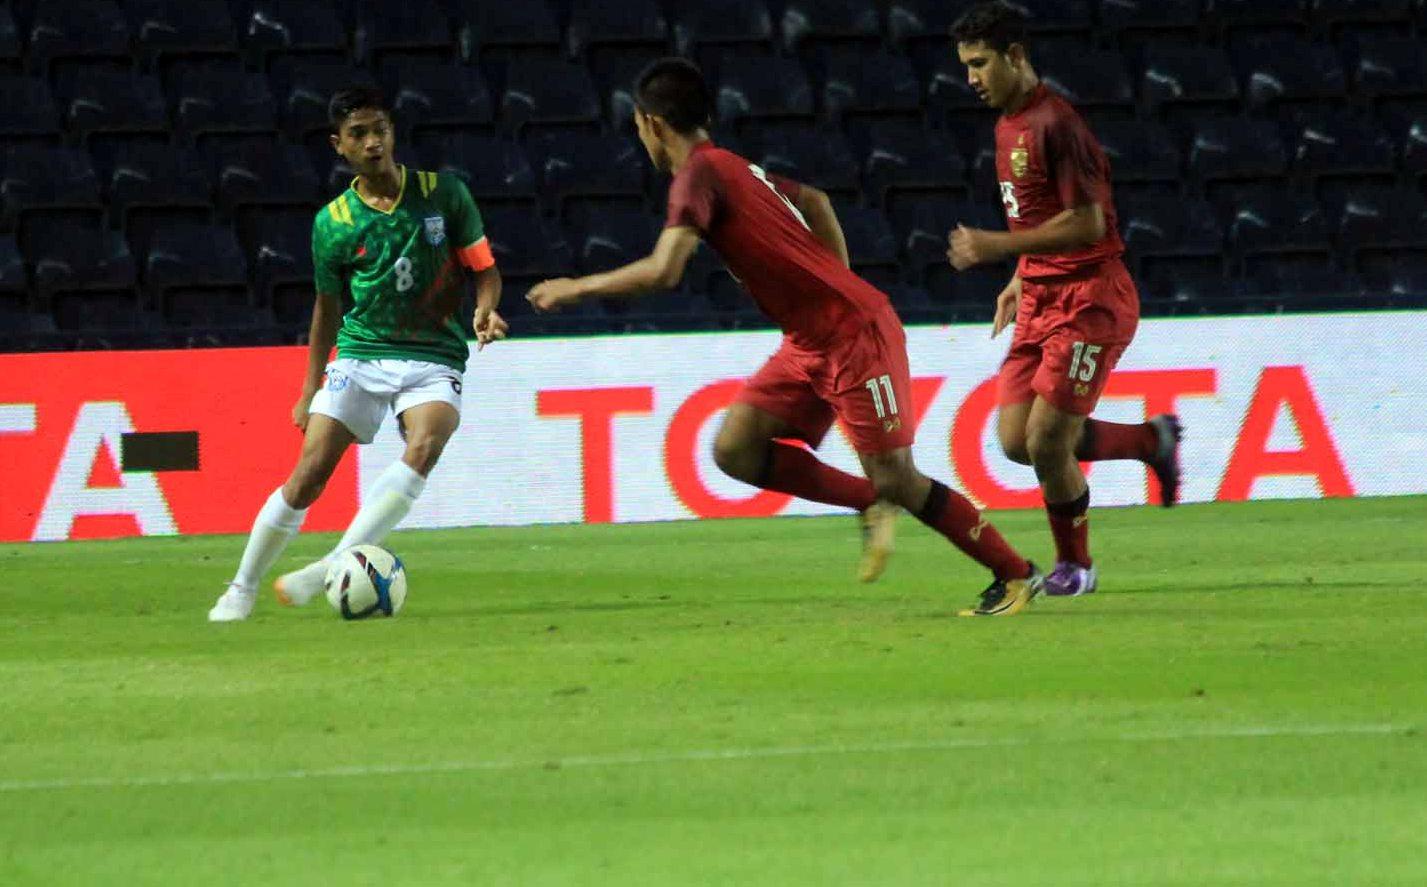 UEFA tournament: U15 boys draw 1-1 with Thailand